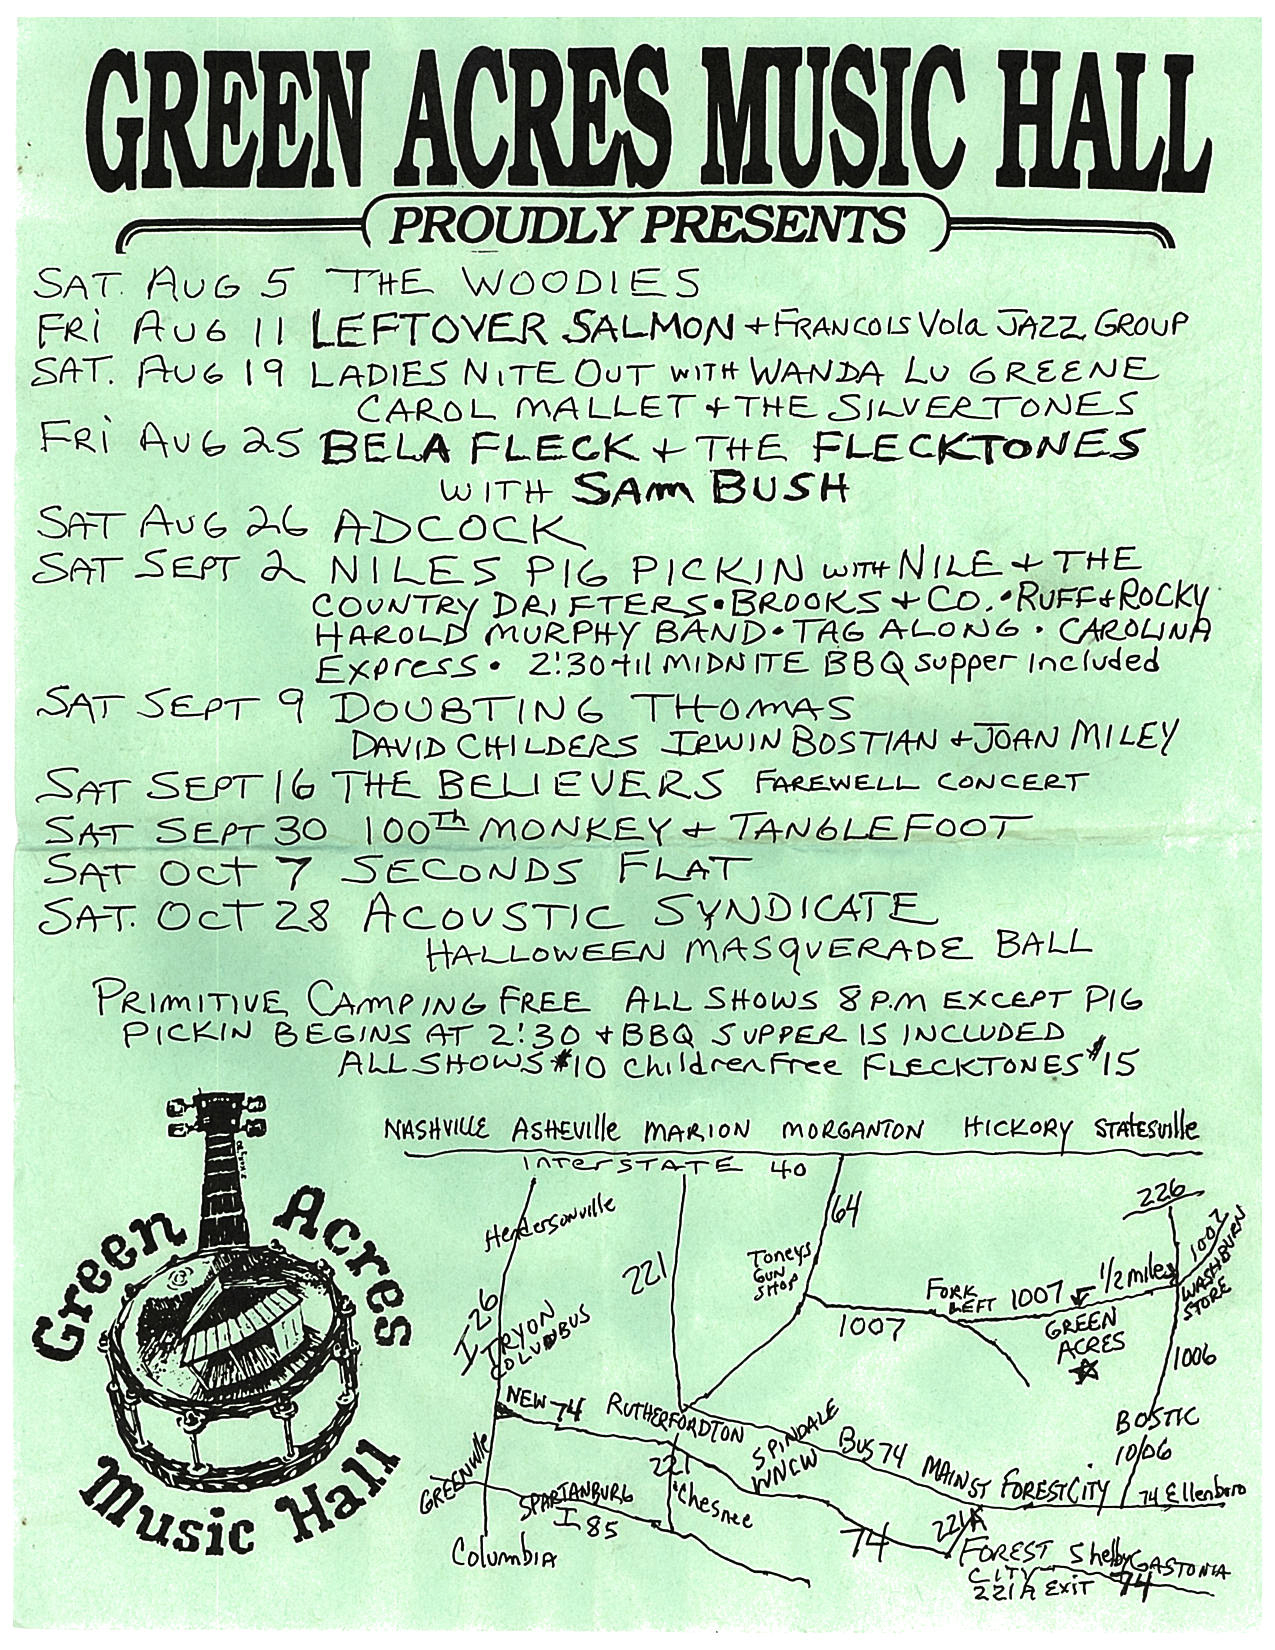 Green Acres flyer 1995.jpg